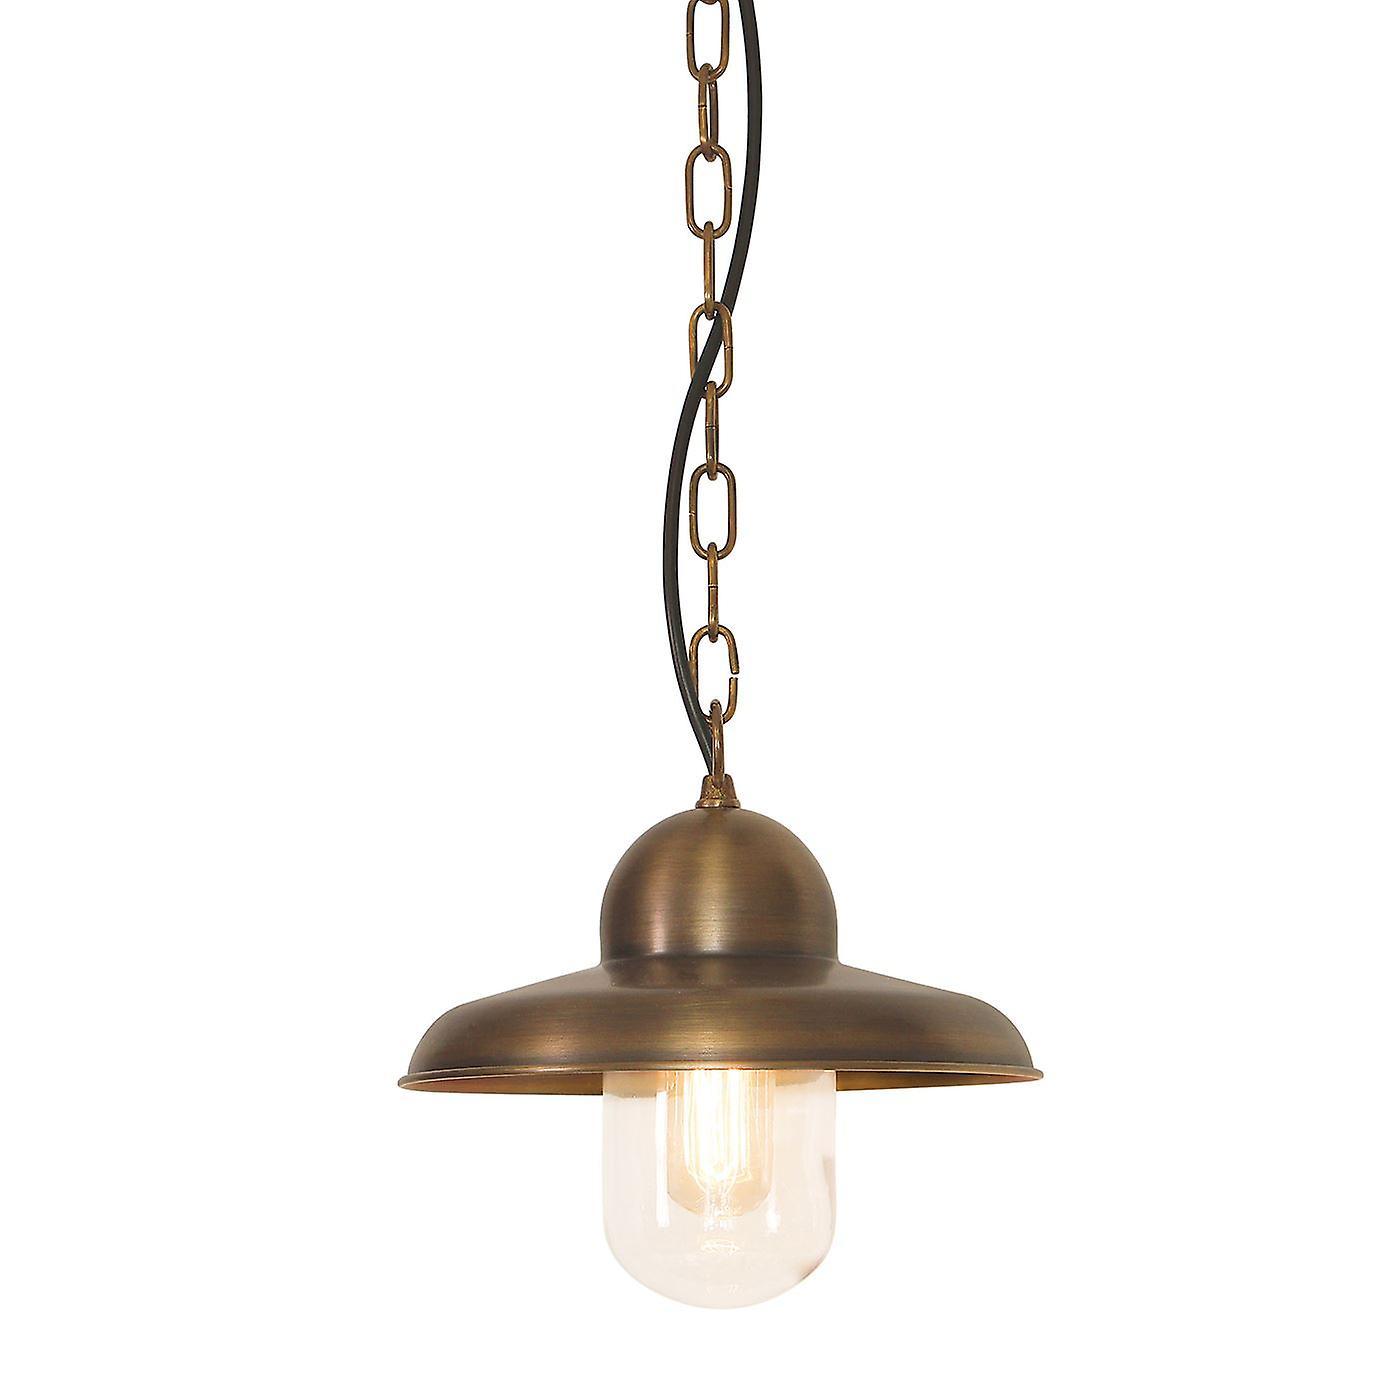 Somerton BRass Outdoor Ceiling Chain Lantern - Elstead Lighting Somerton Ch BR